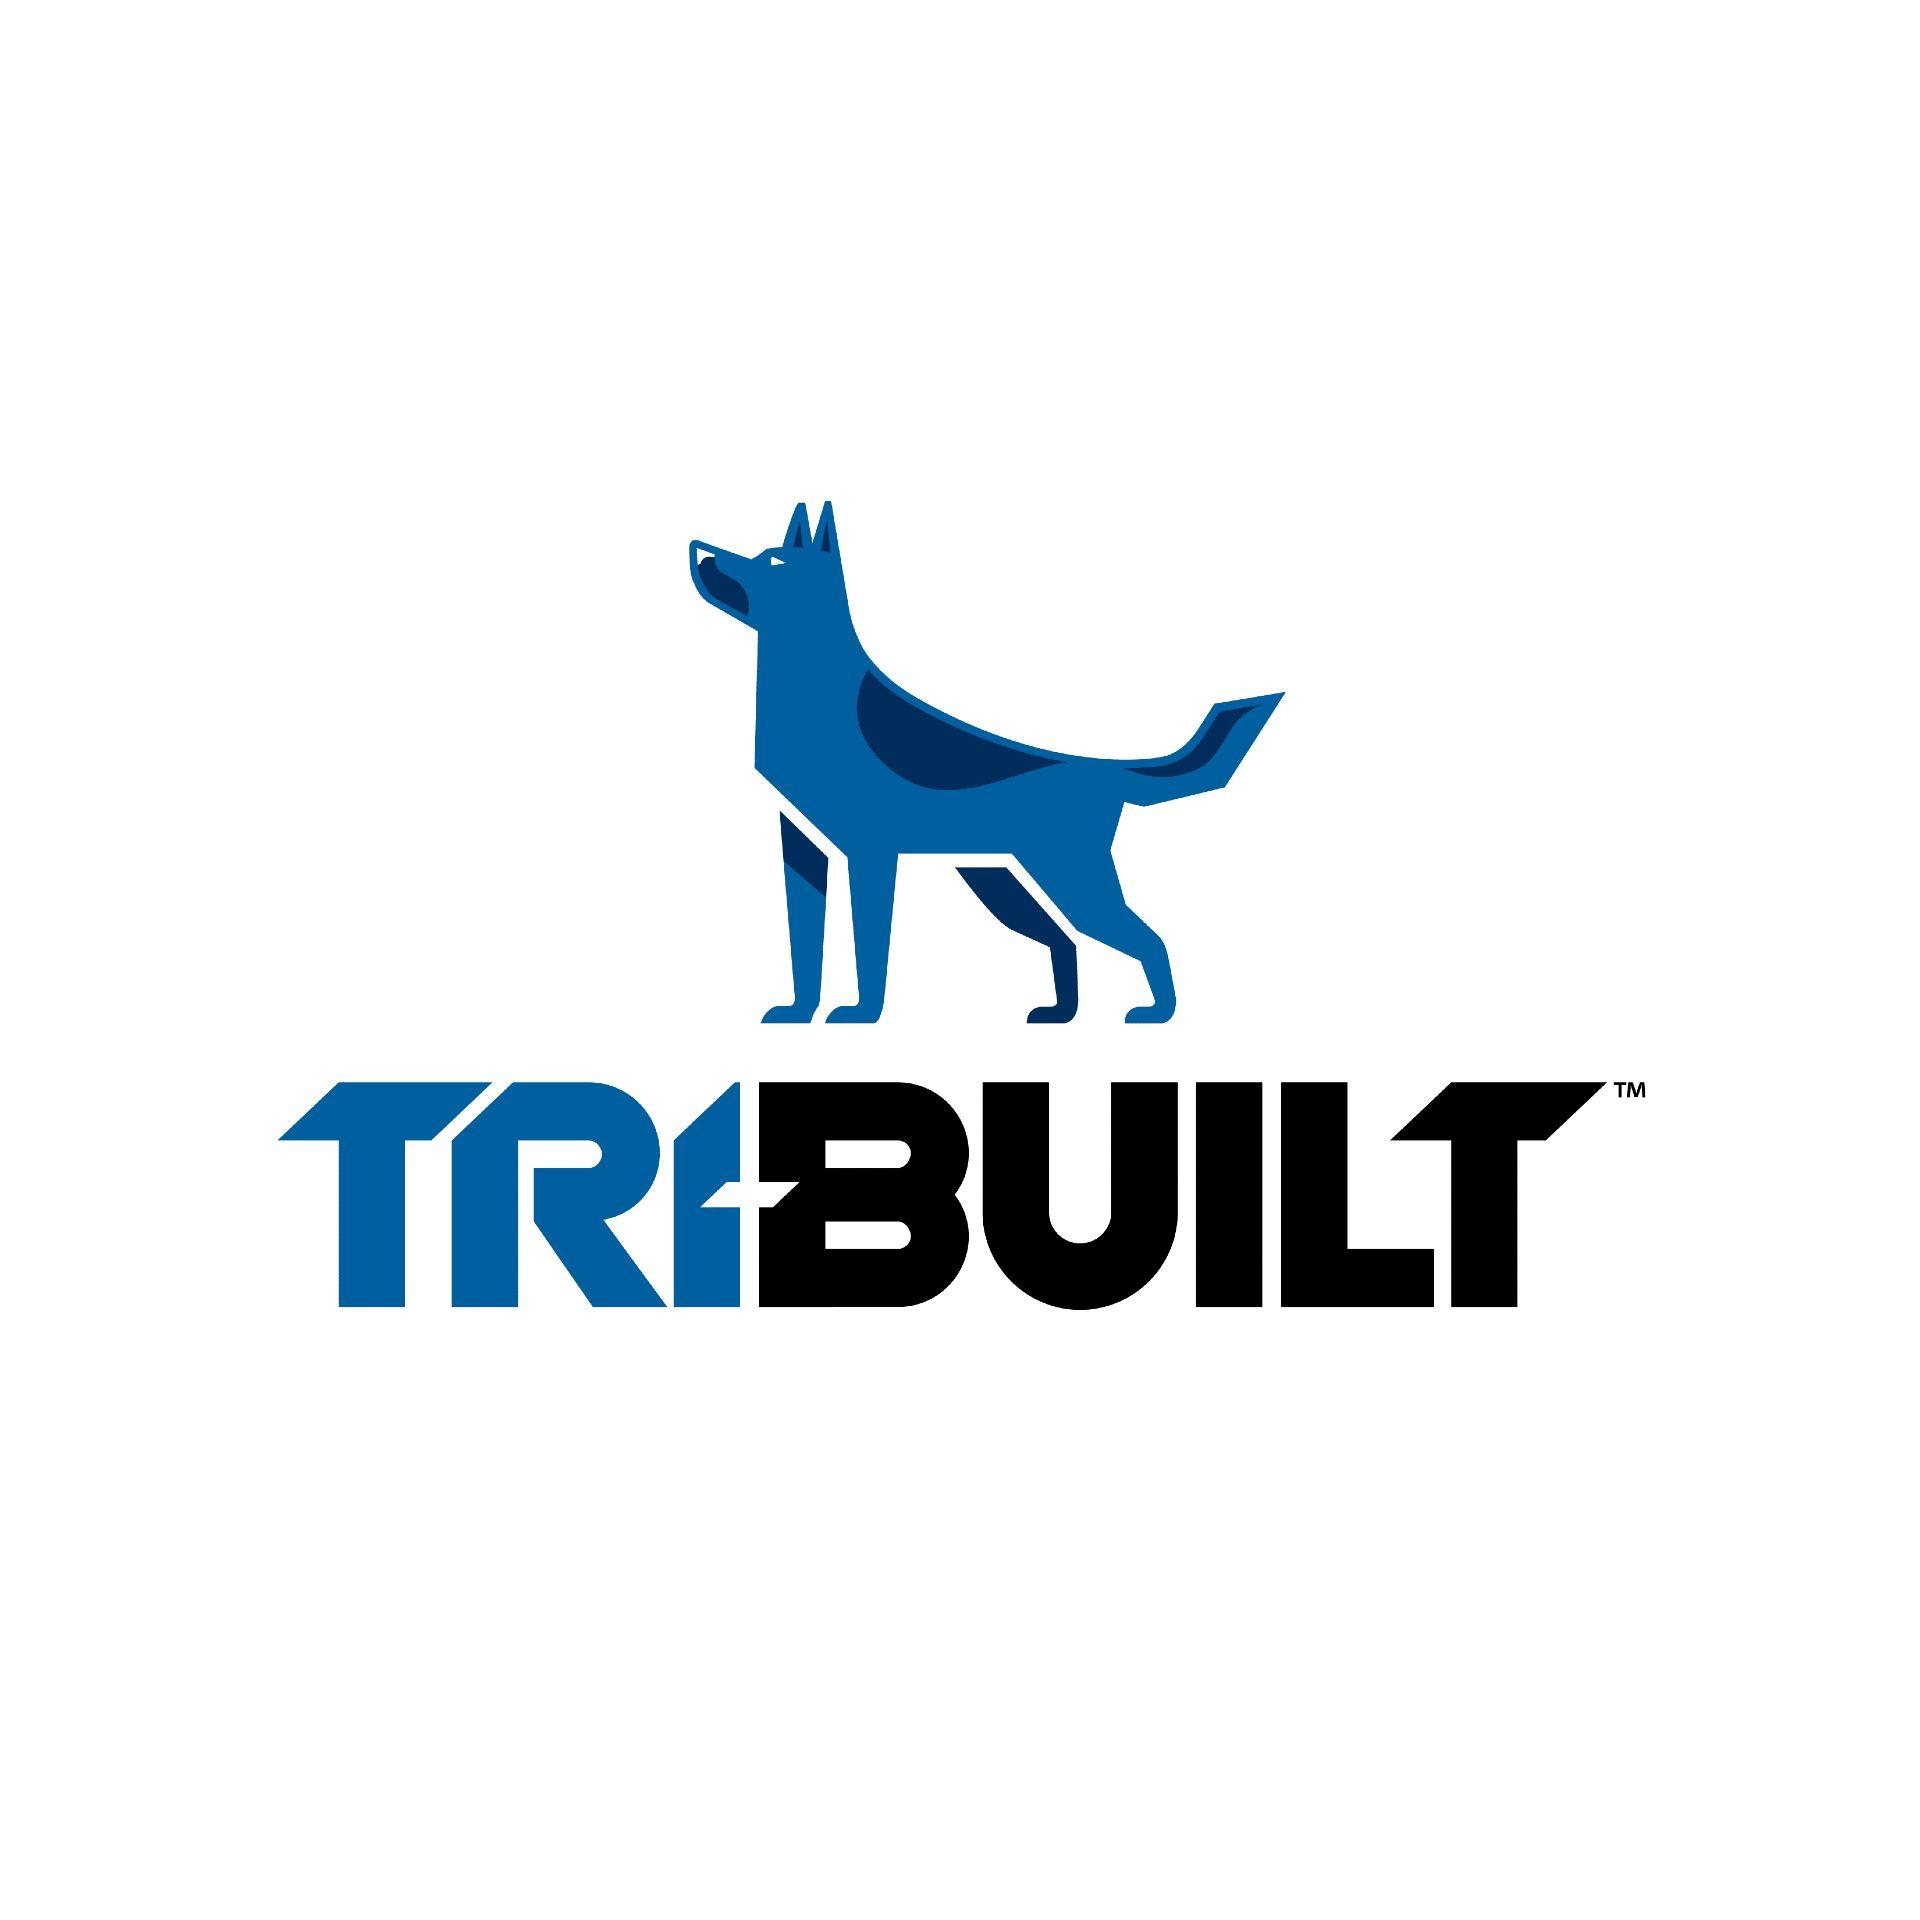 "TRI-BUILT 1/2"" 2' x 8' Insulation Board with Shiplap Edge"